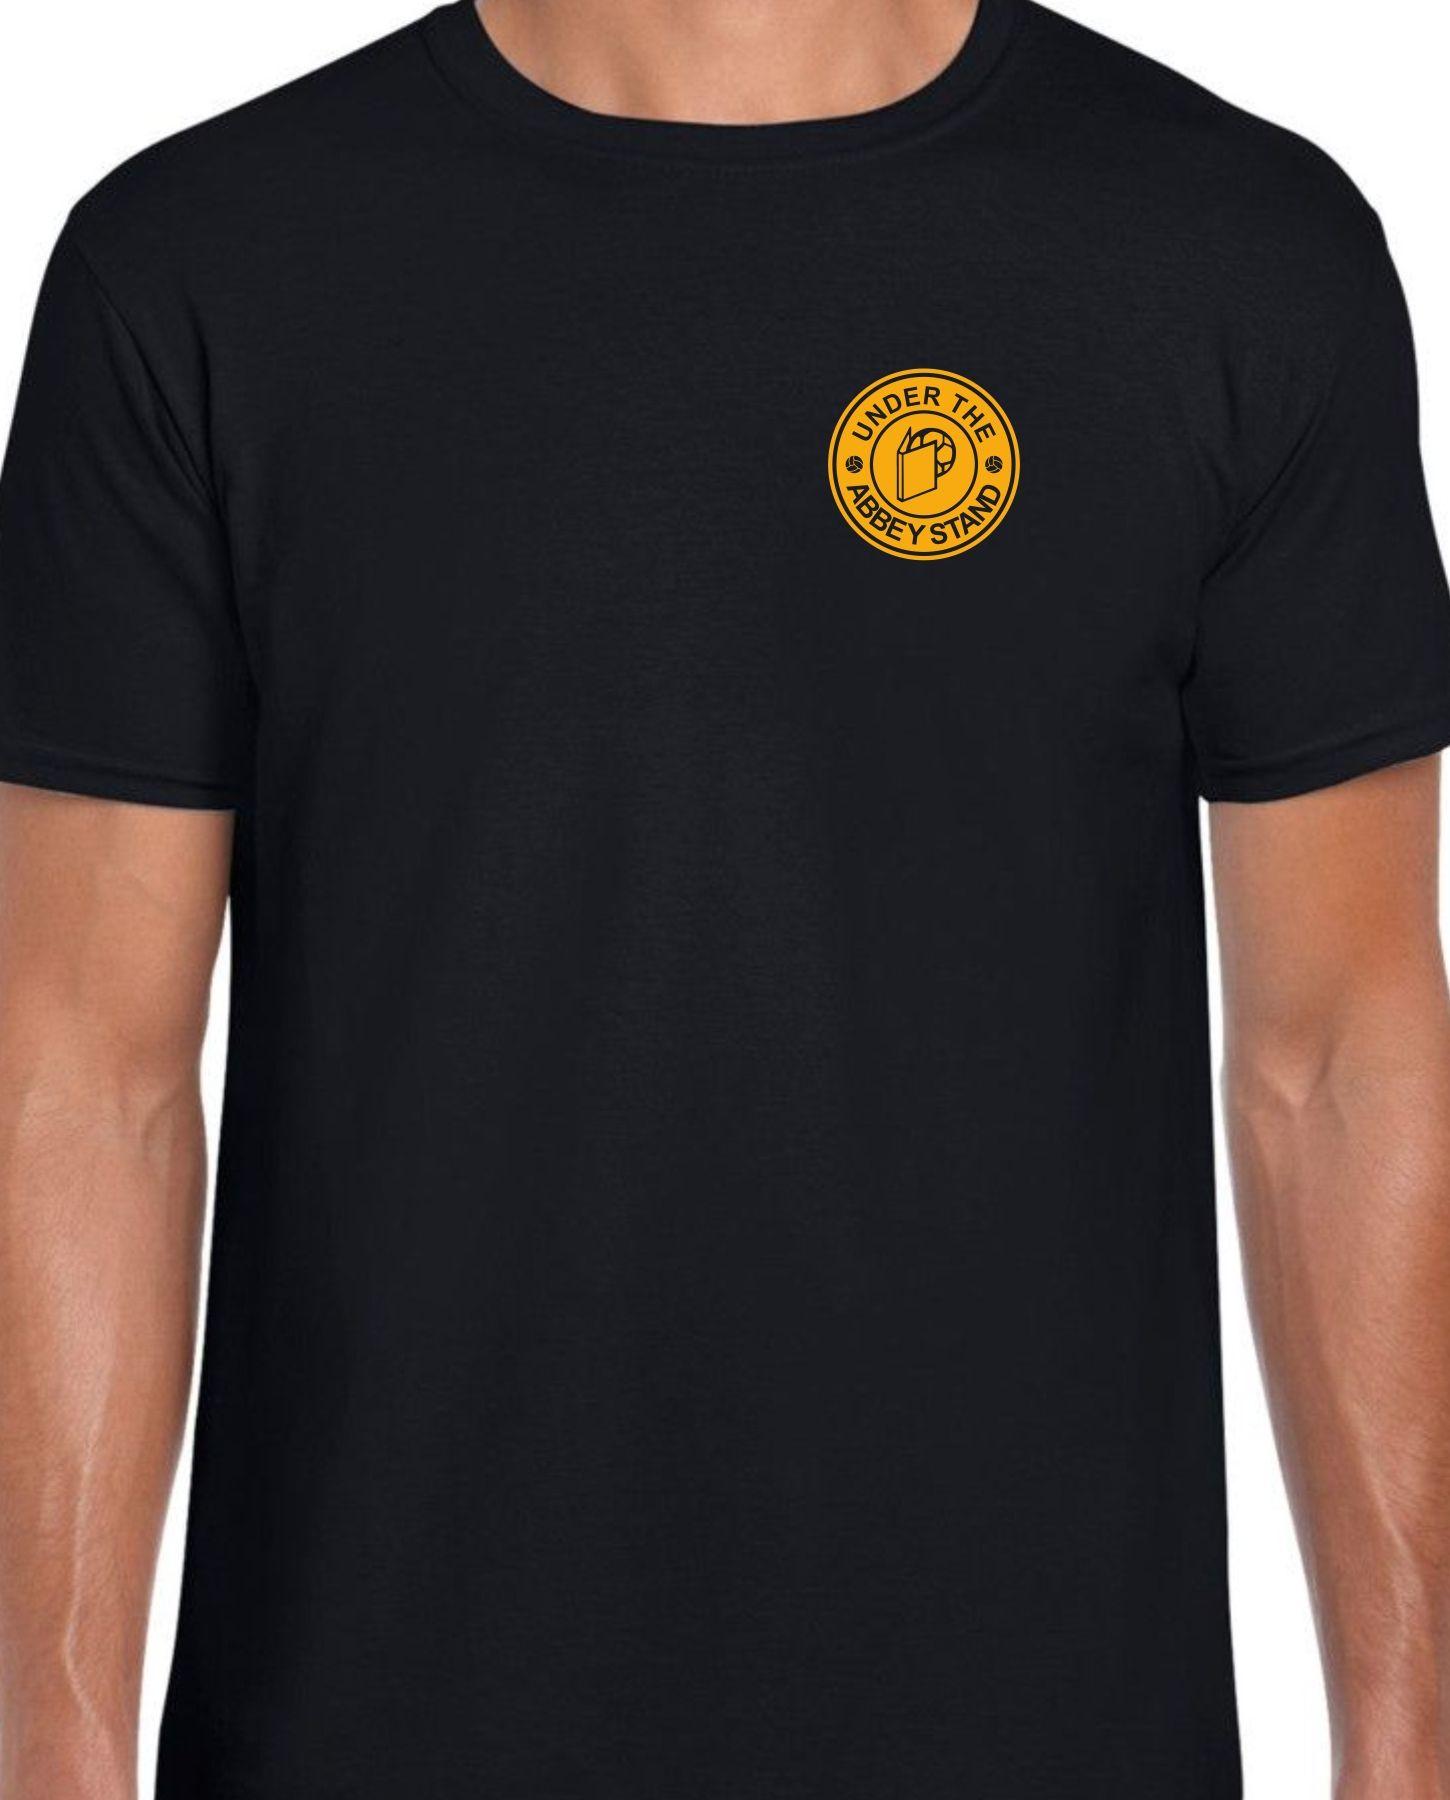 UTAS Printed Logo Black Tee